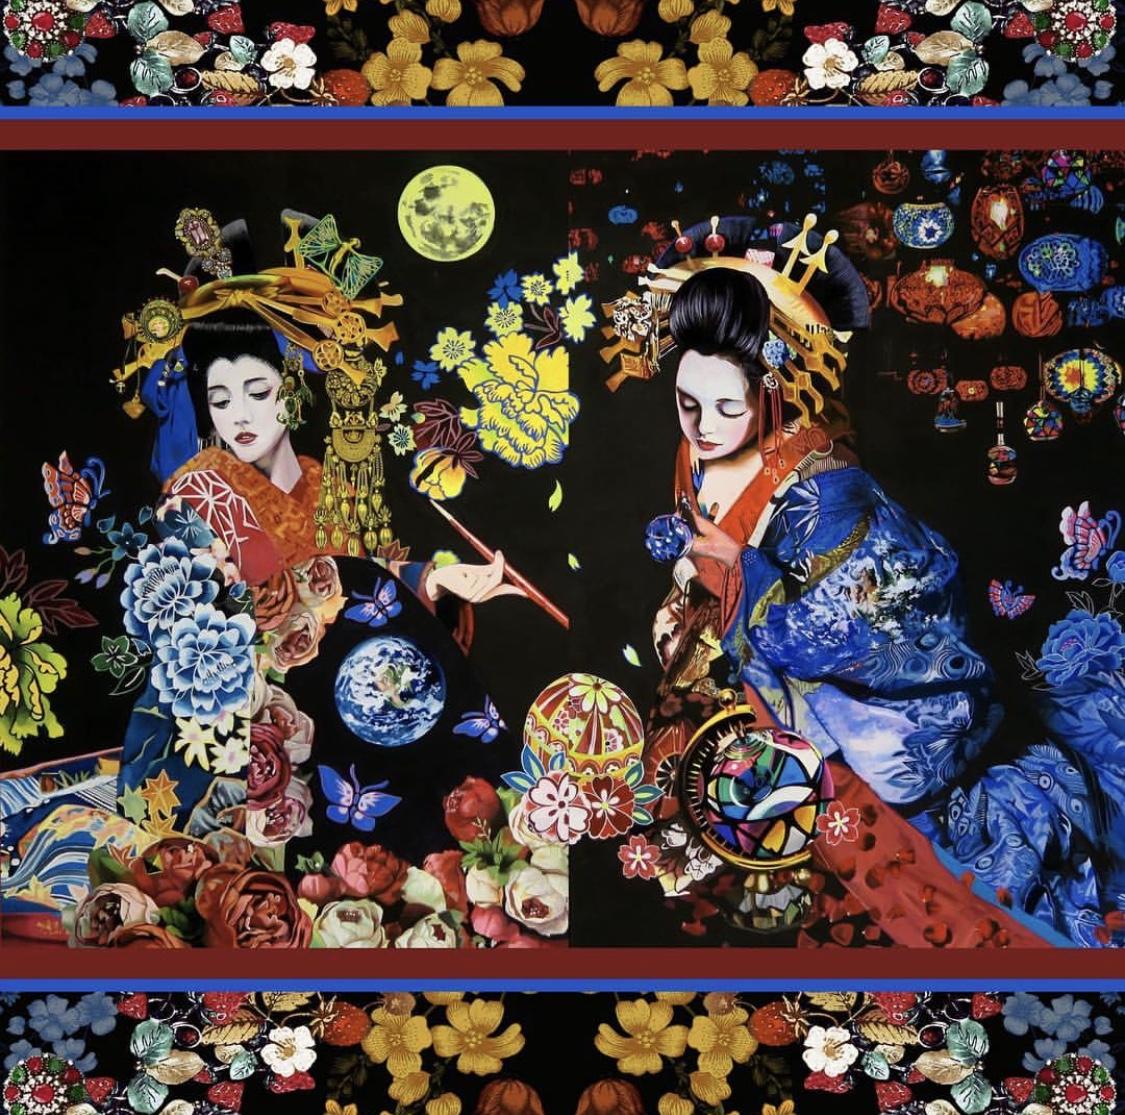 Assort presents solo exhibition of Maika Kobayashi